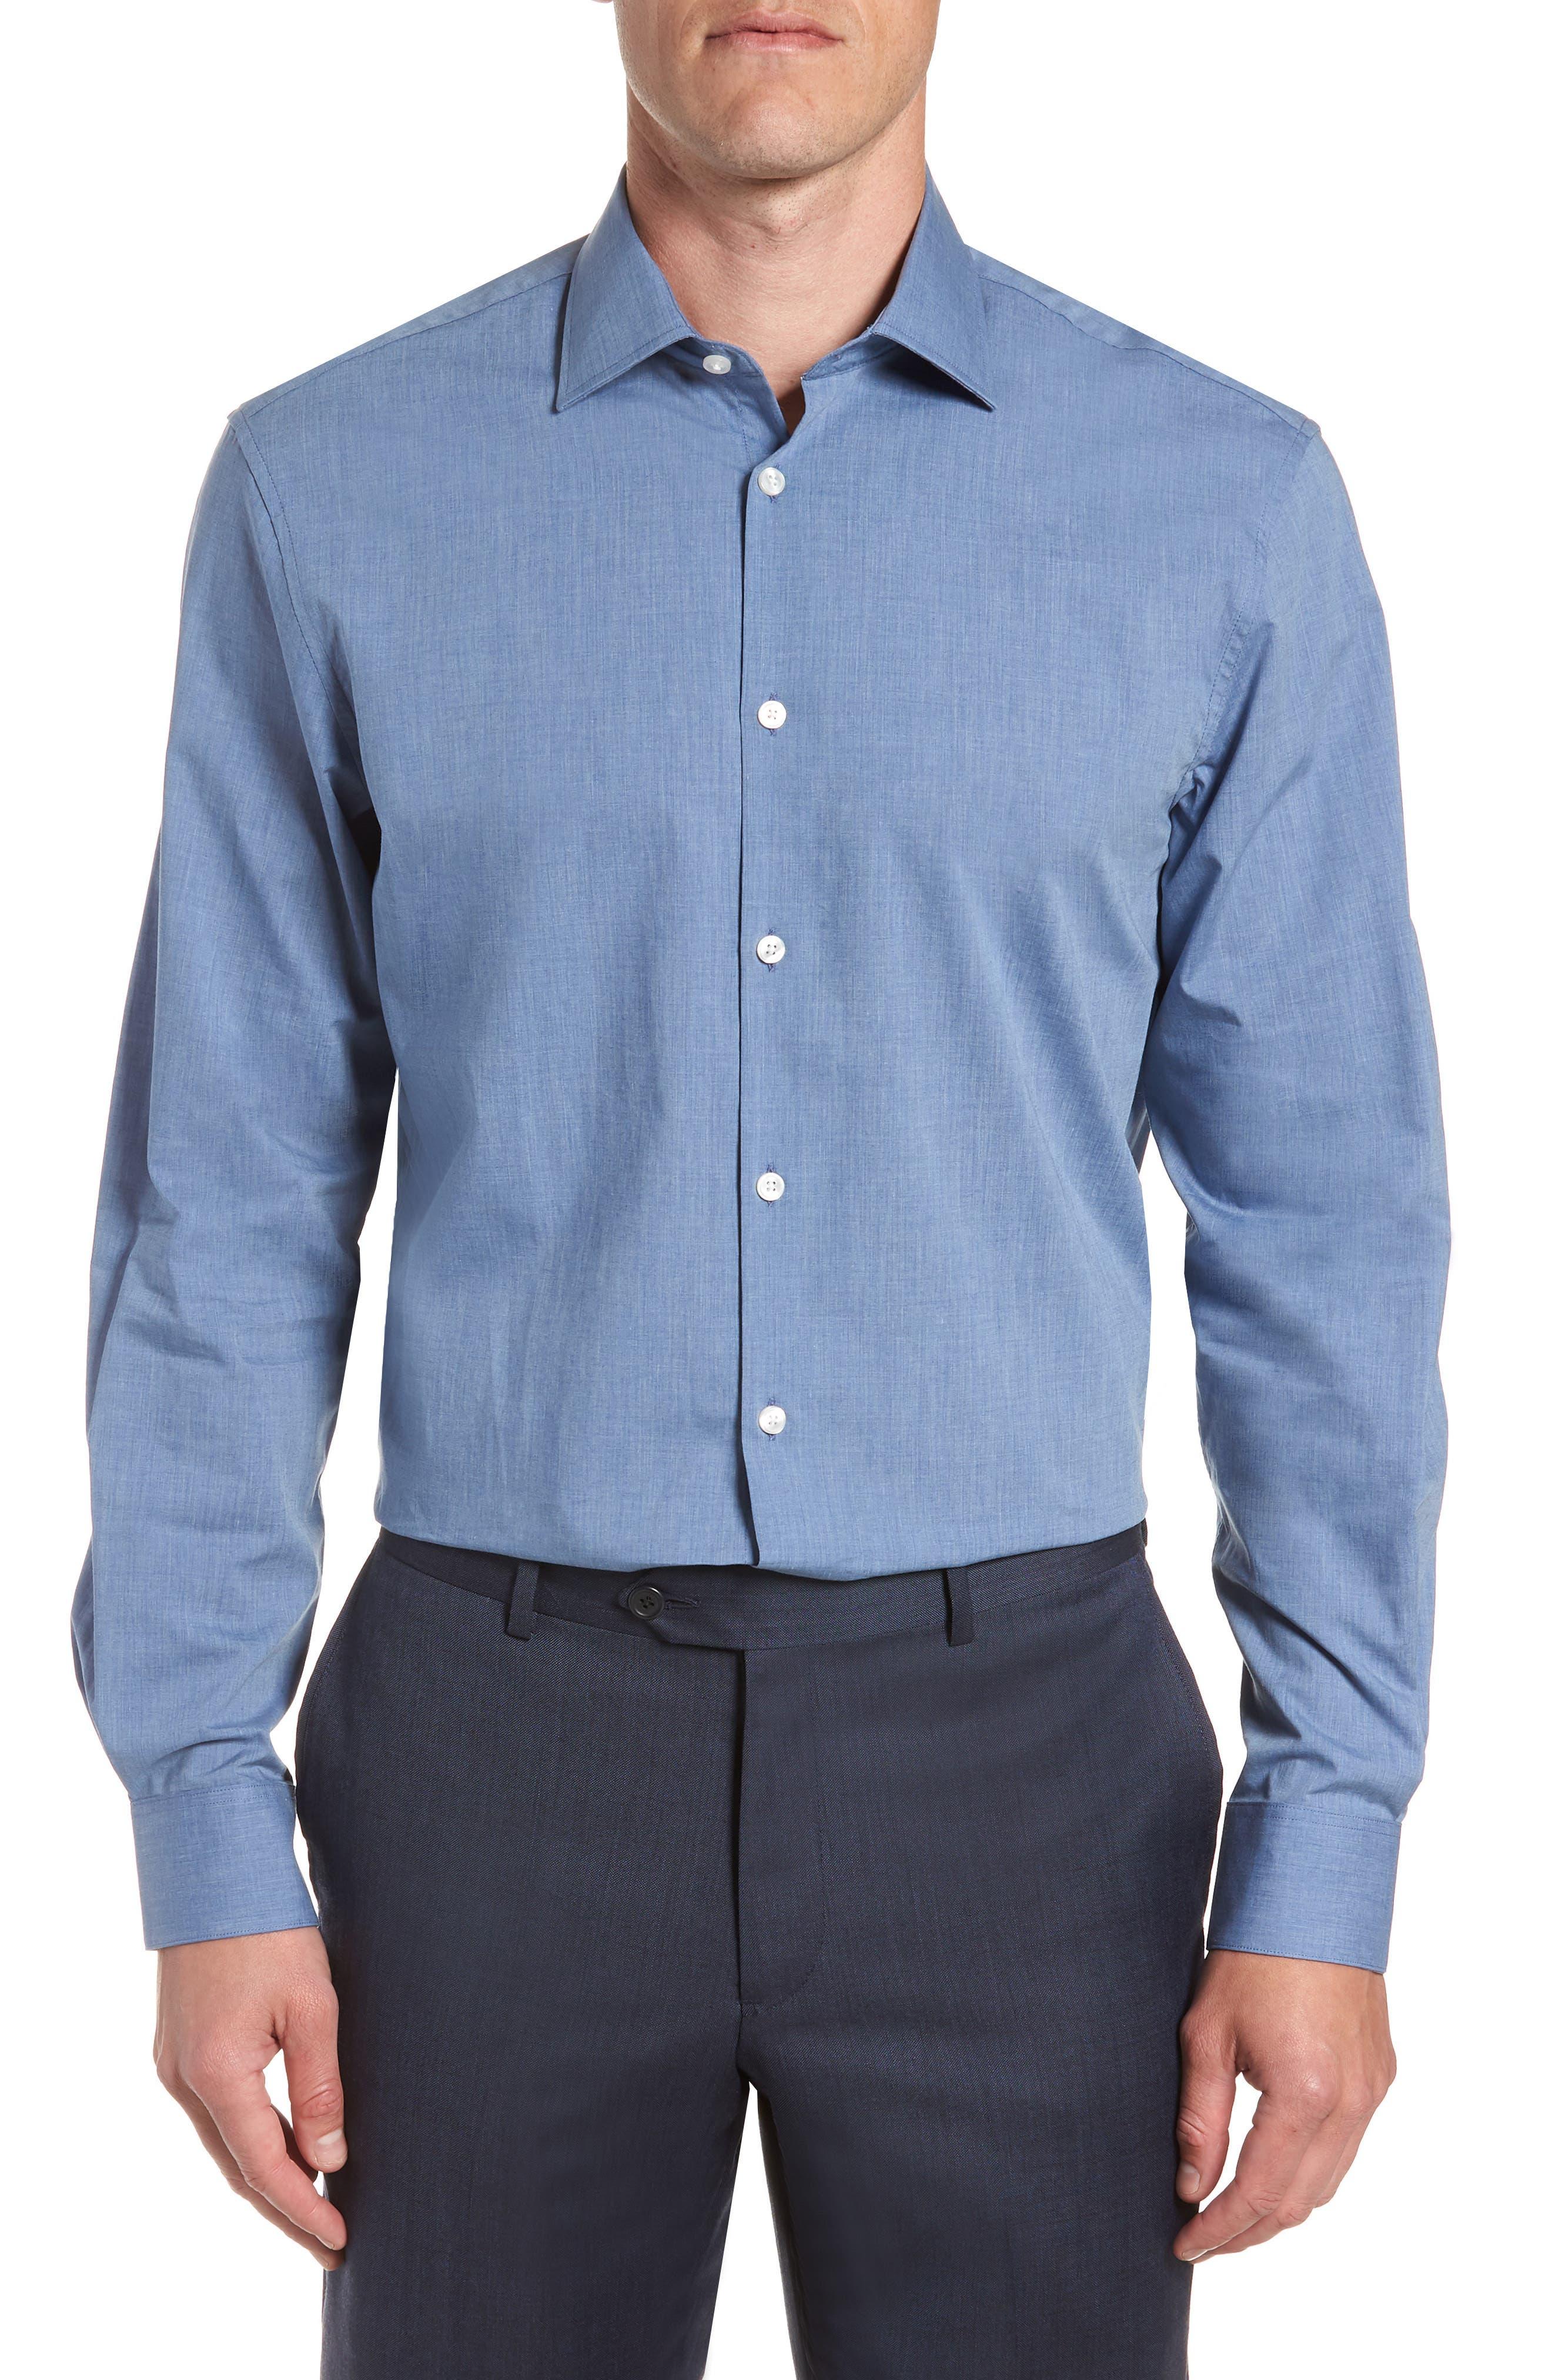 Regular Fit Solid Dress Shirt,                             Main thumbnail 1, color,                             BLUE HEATHER